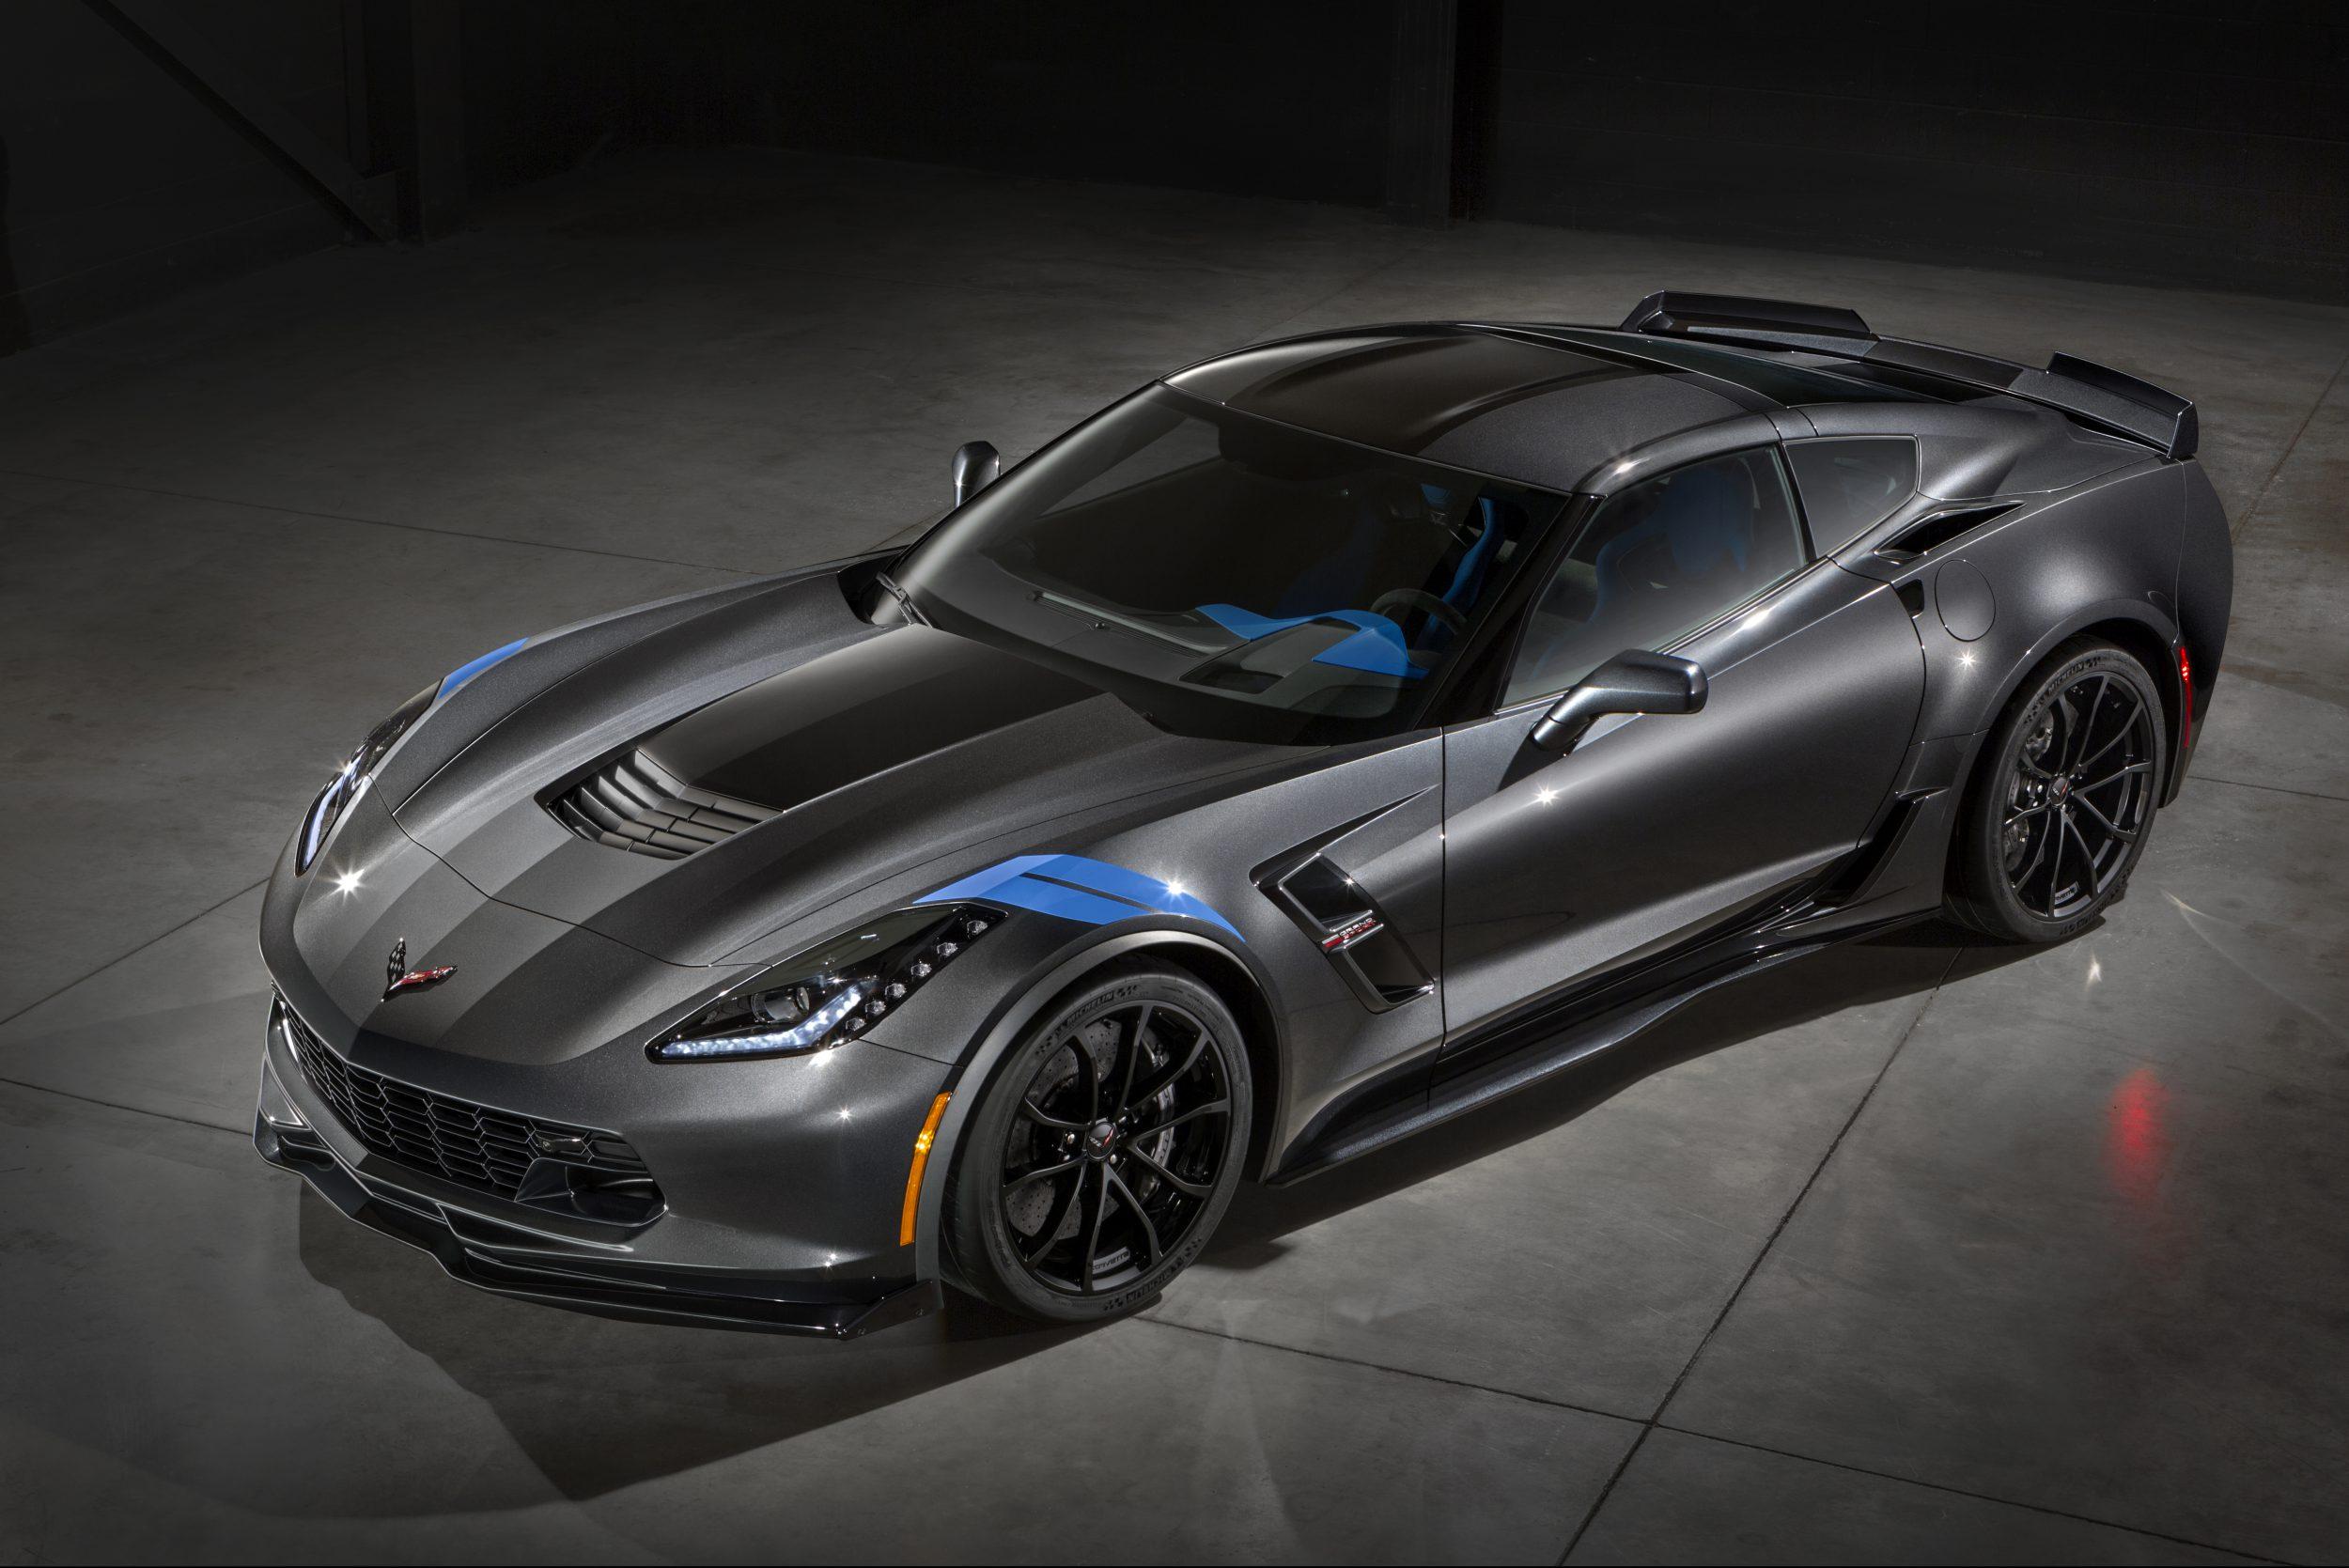 2017 Corvette Grand Sport